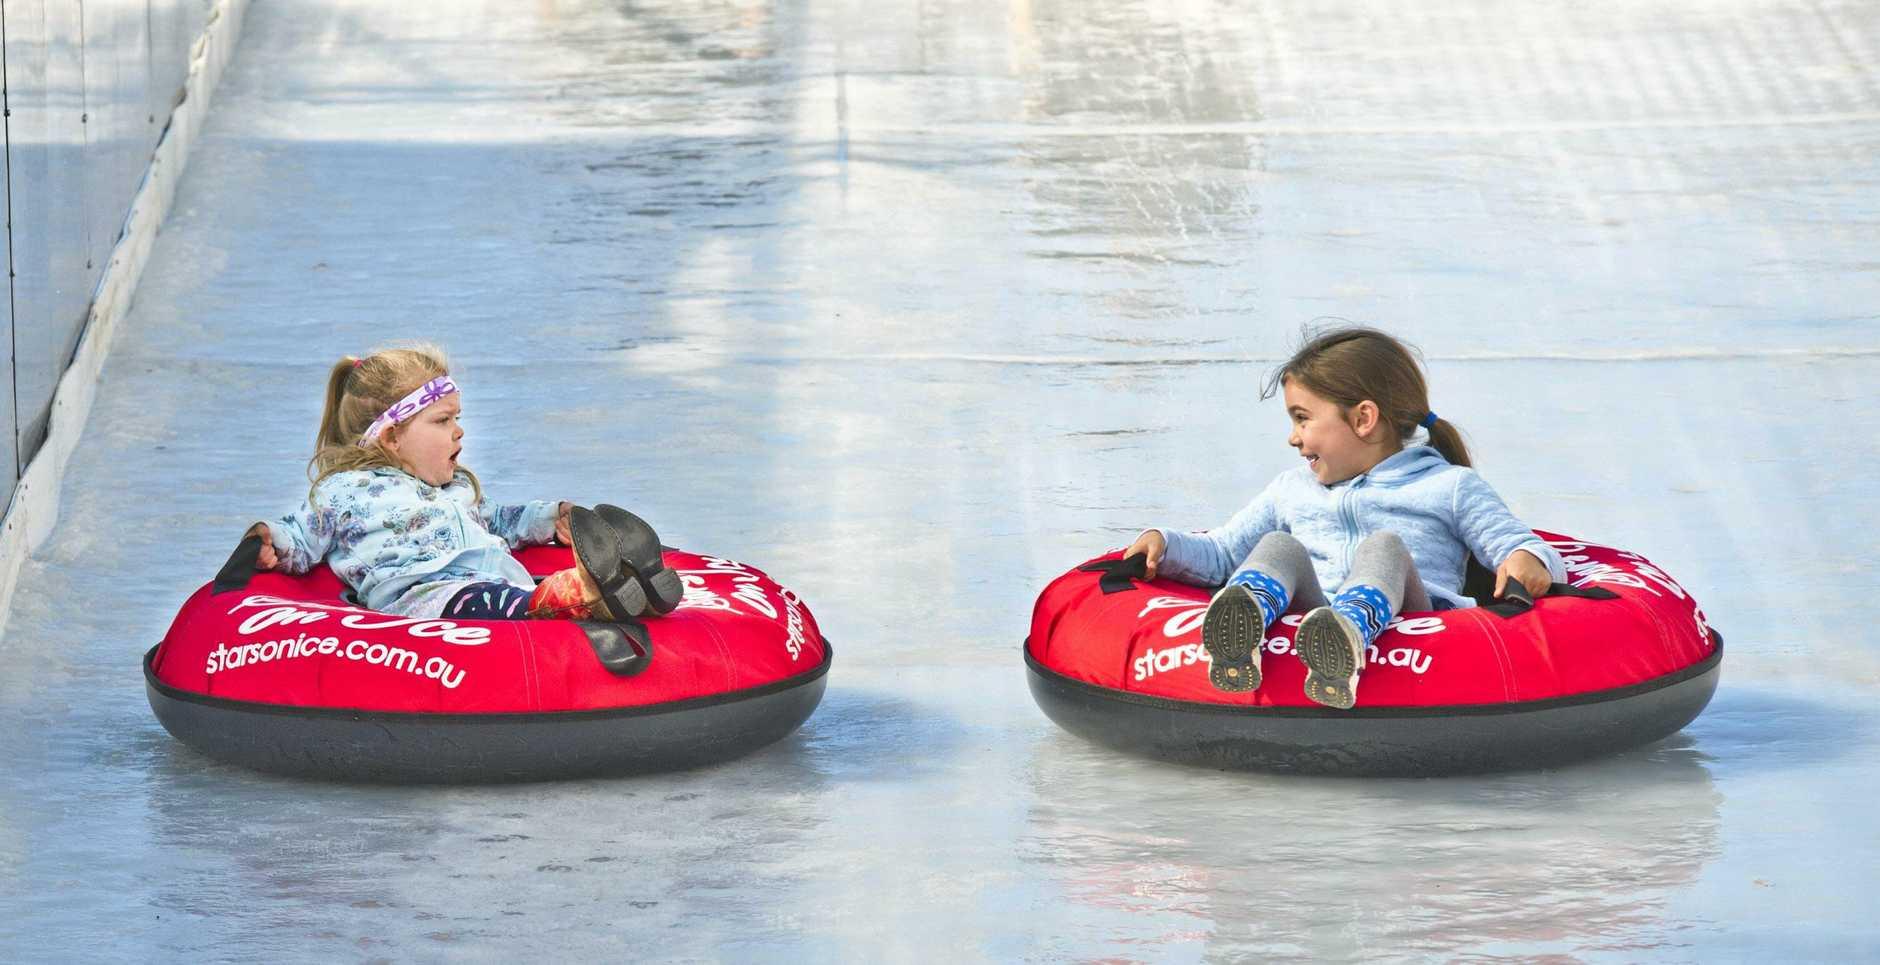 Sisters Lexi and Mackenzie Burlingham take on the Ice Slide at Winter Wonderland.